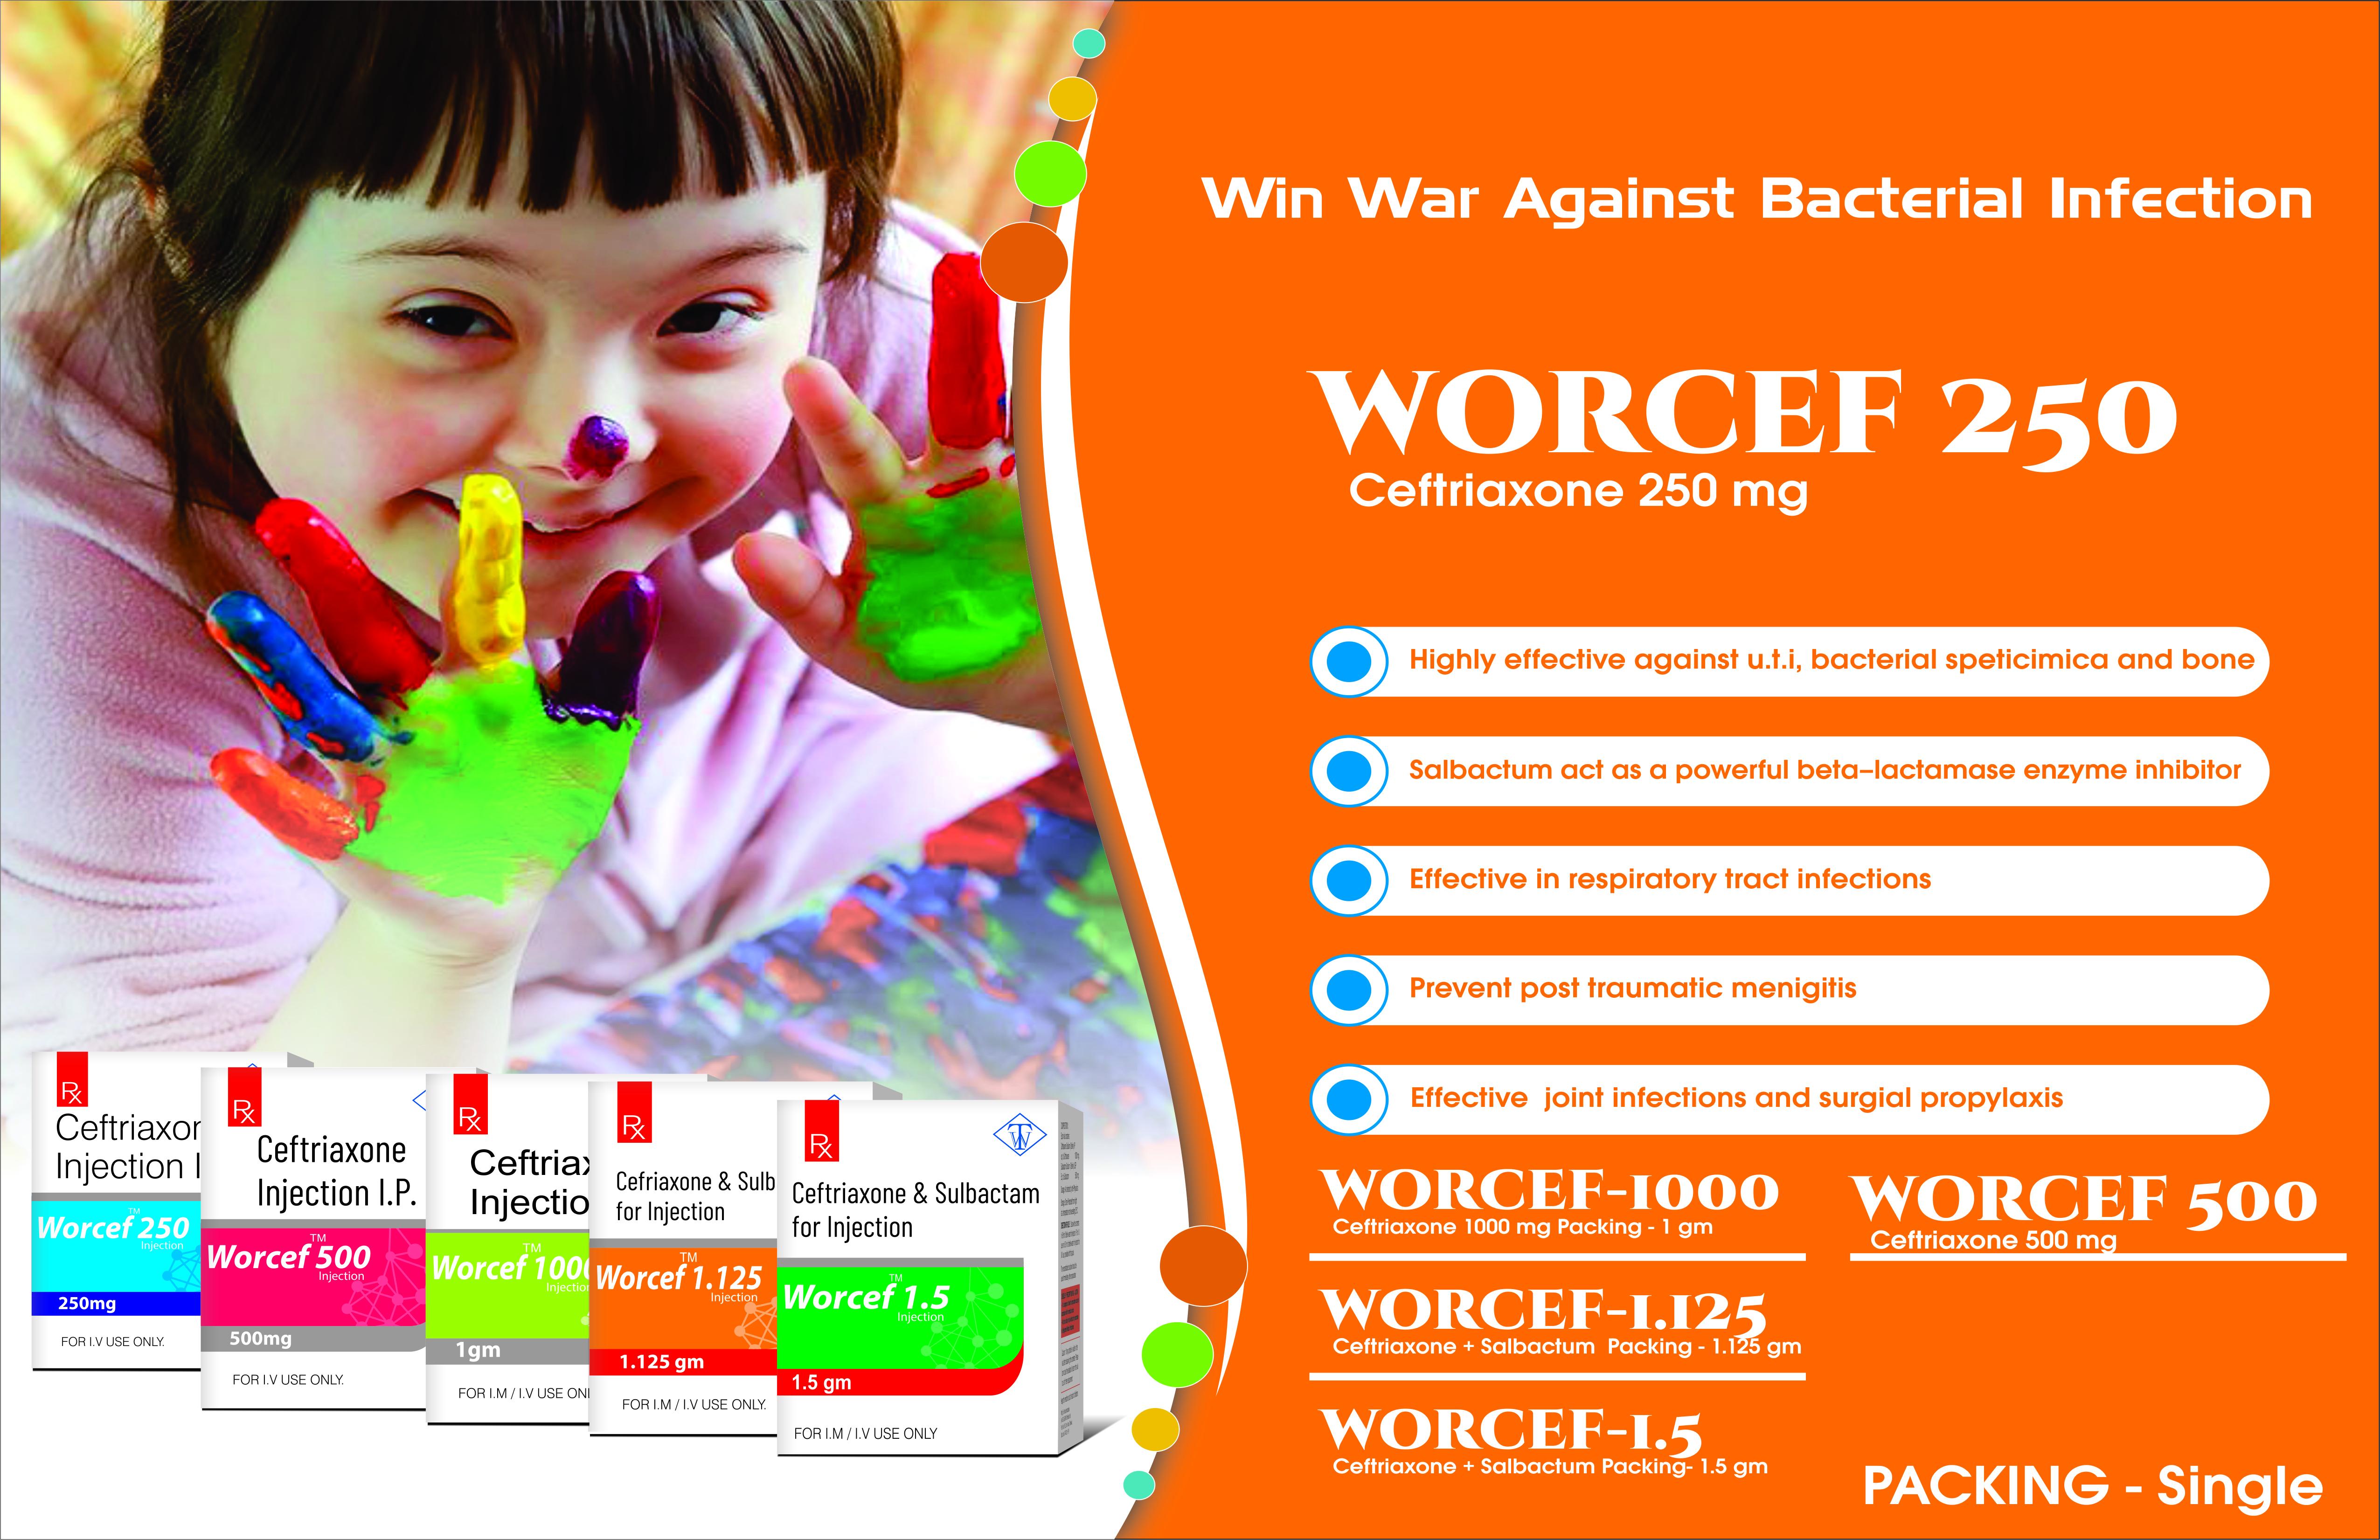 Truworth worcef 250 (Ceftriaxone 250 mg Injection)